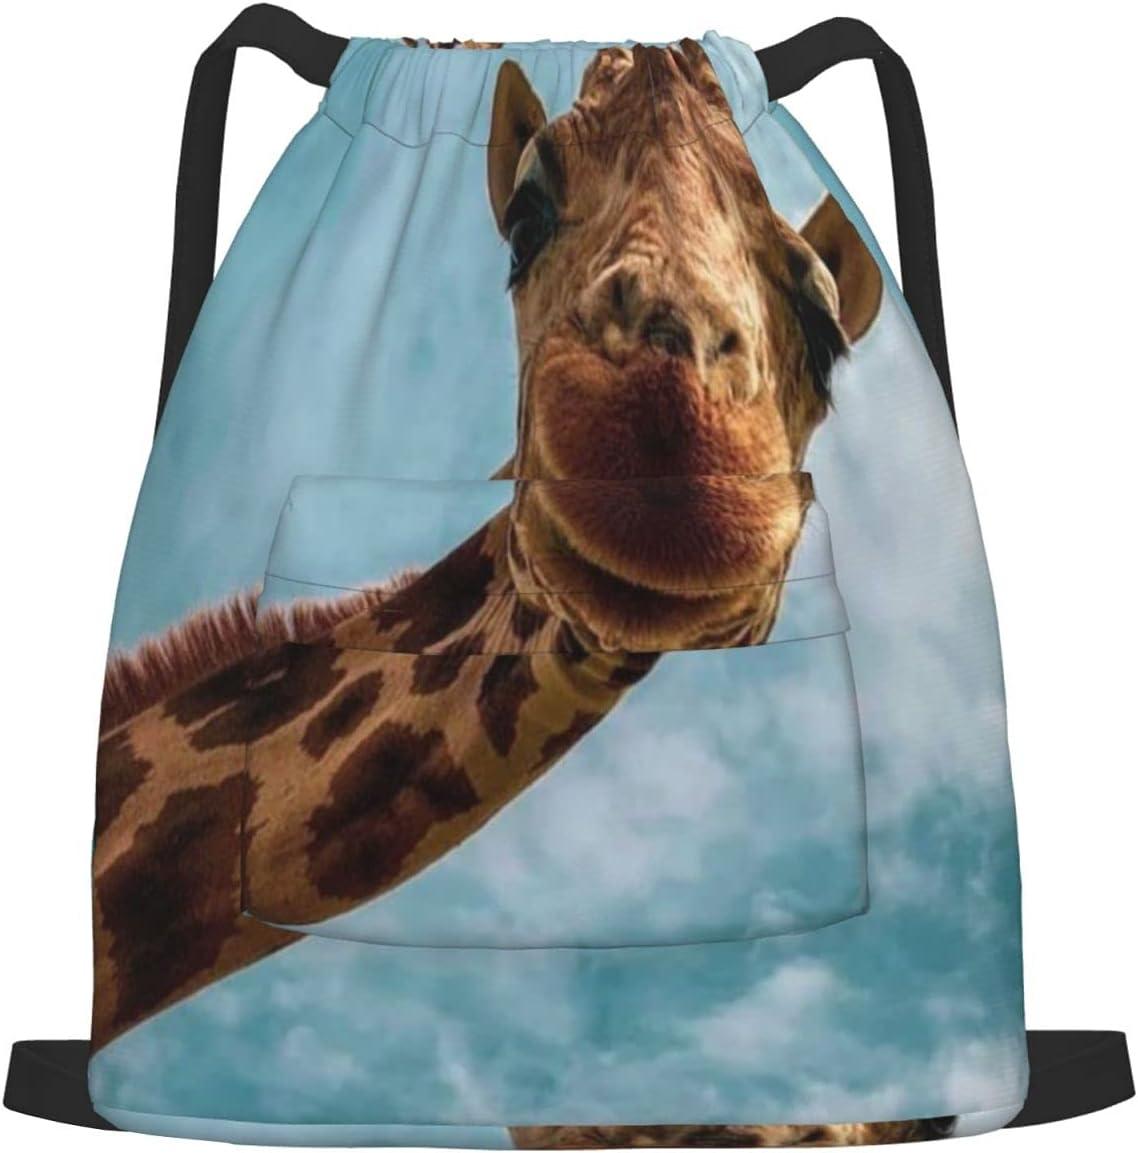 35% OFF Cute Giraffe New Orleans Mall Drawstring Sports Backpack Bag For Gym Unisex Yoga